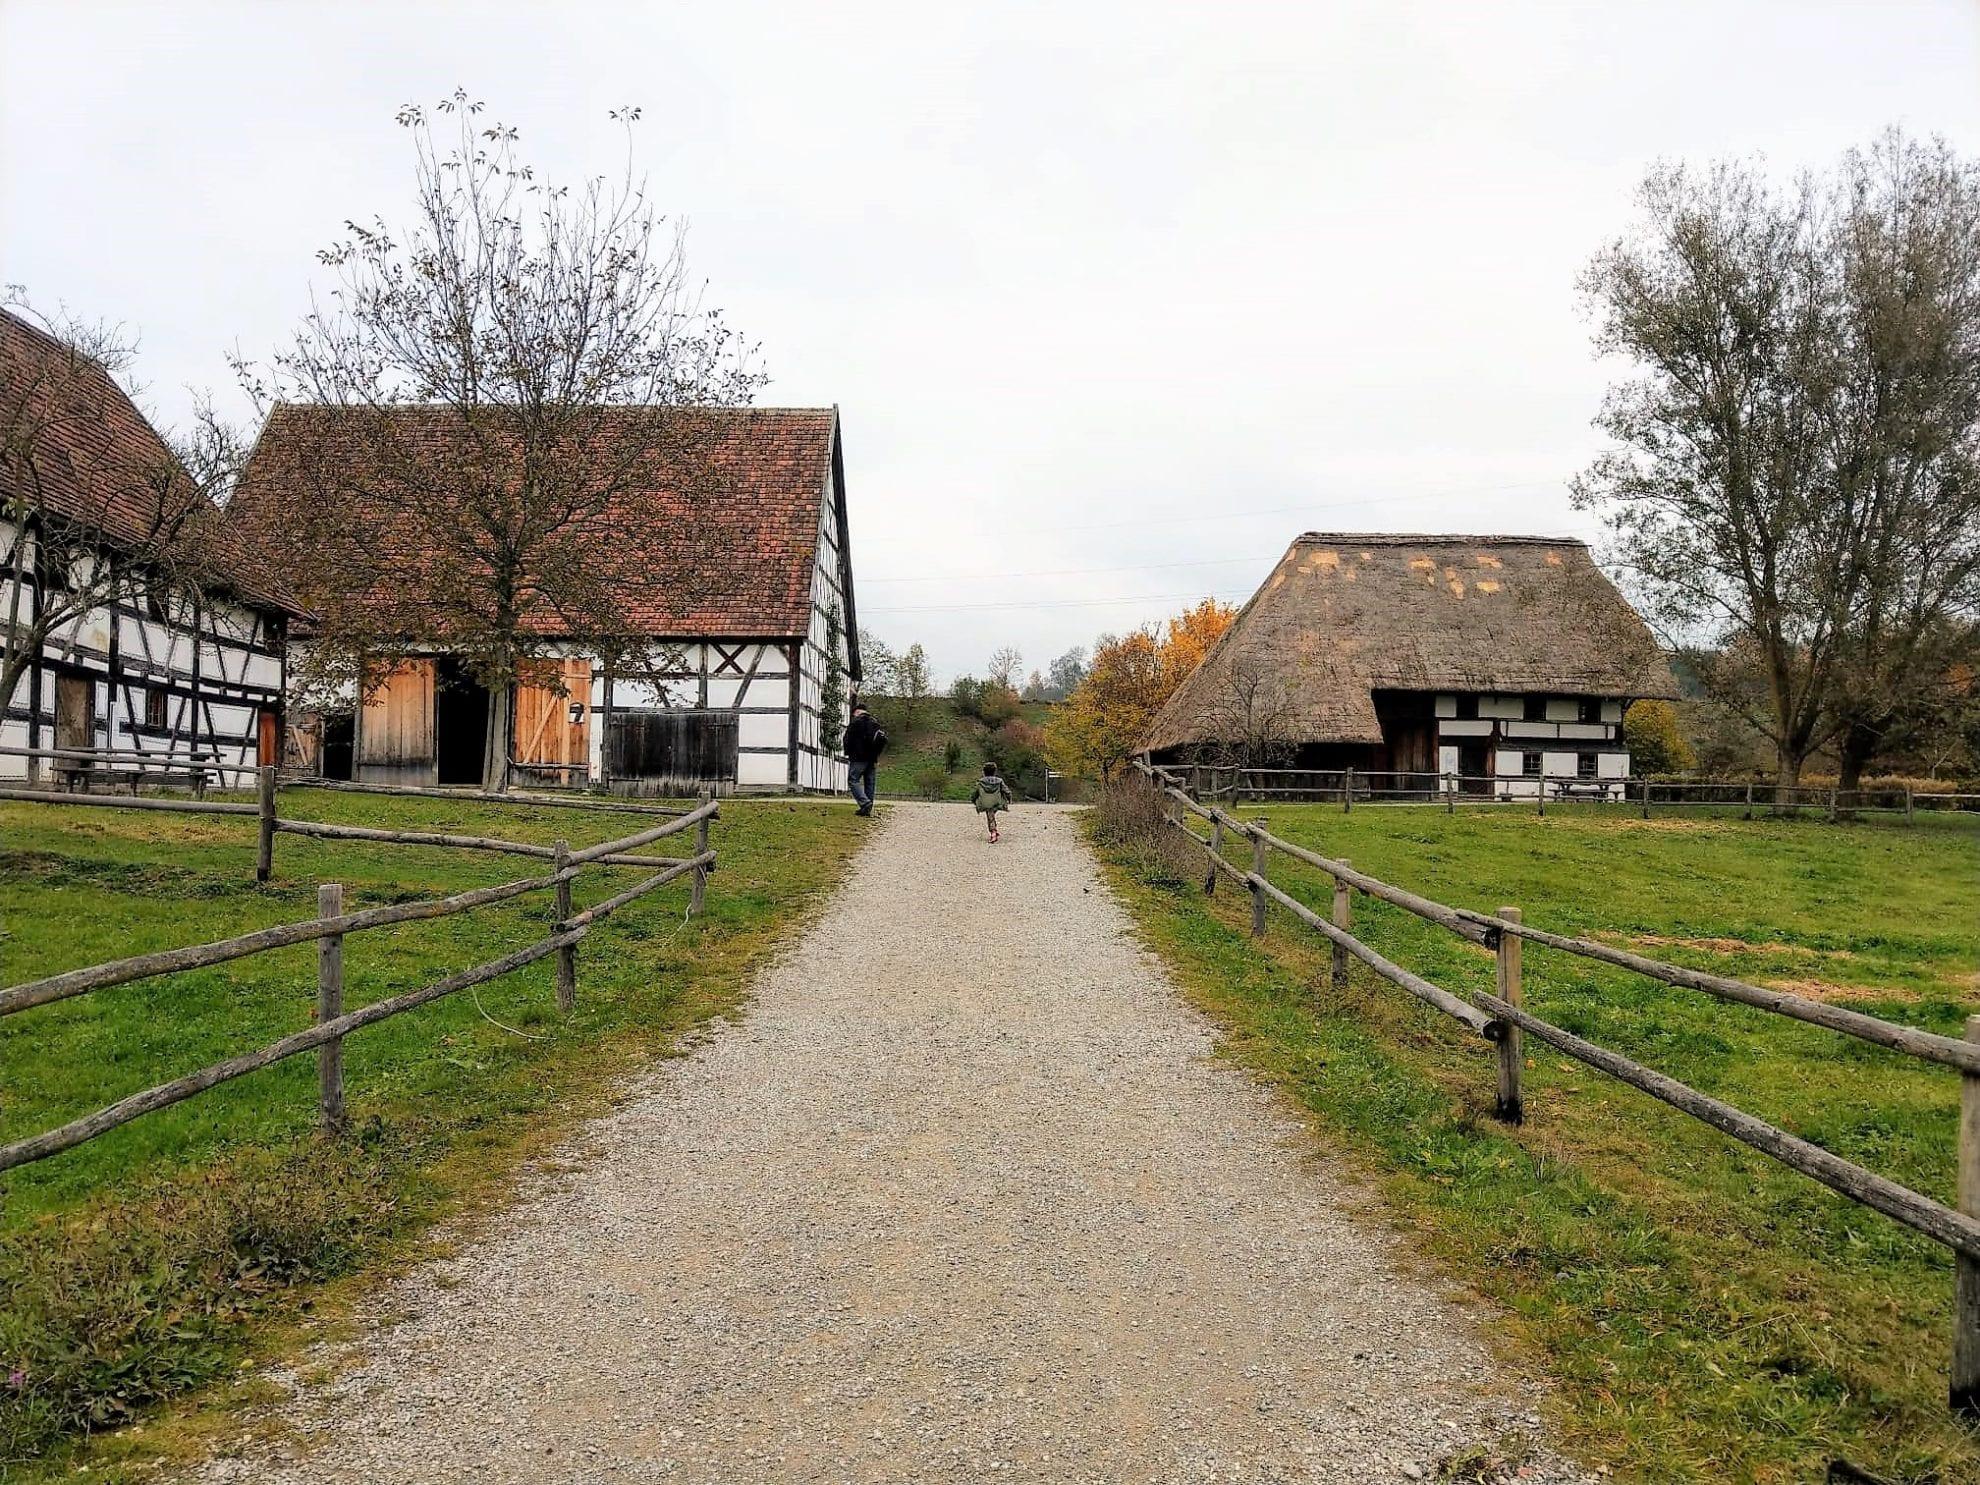 Bauernhofmuseum Illerbeuren, Museum, Ausflug, Familienausflug, Ausflugstipp